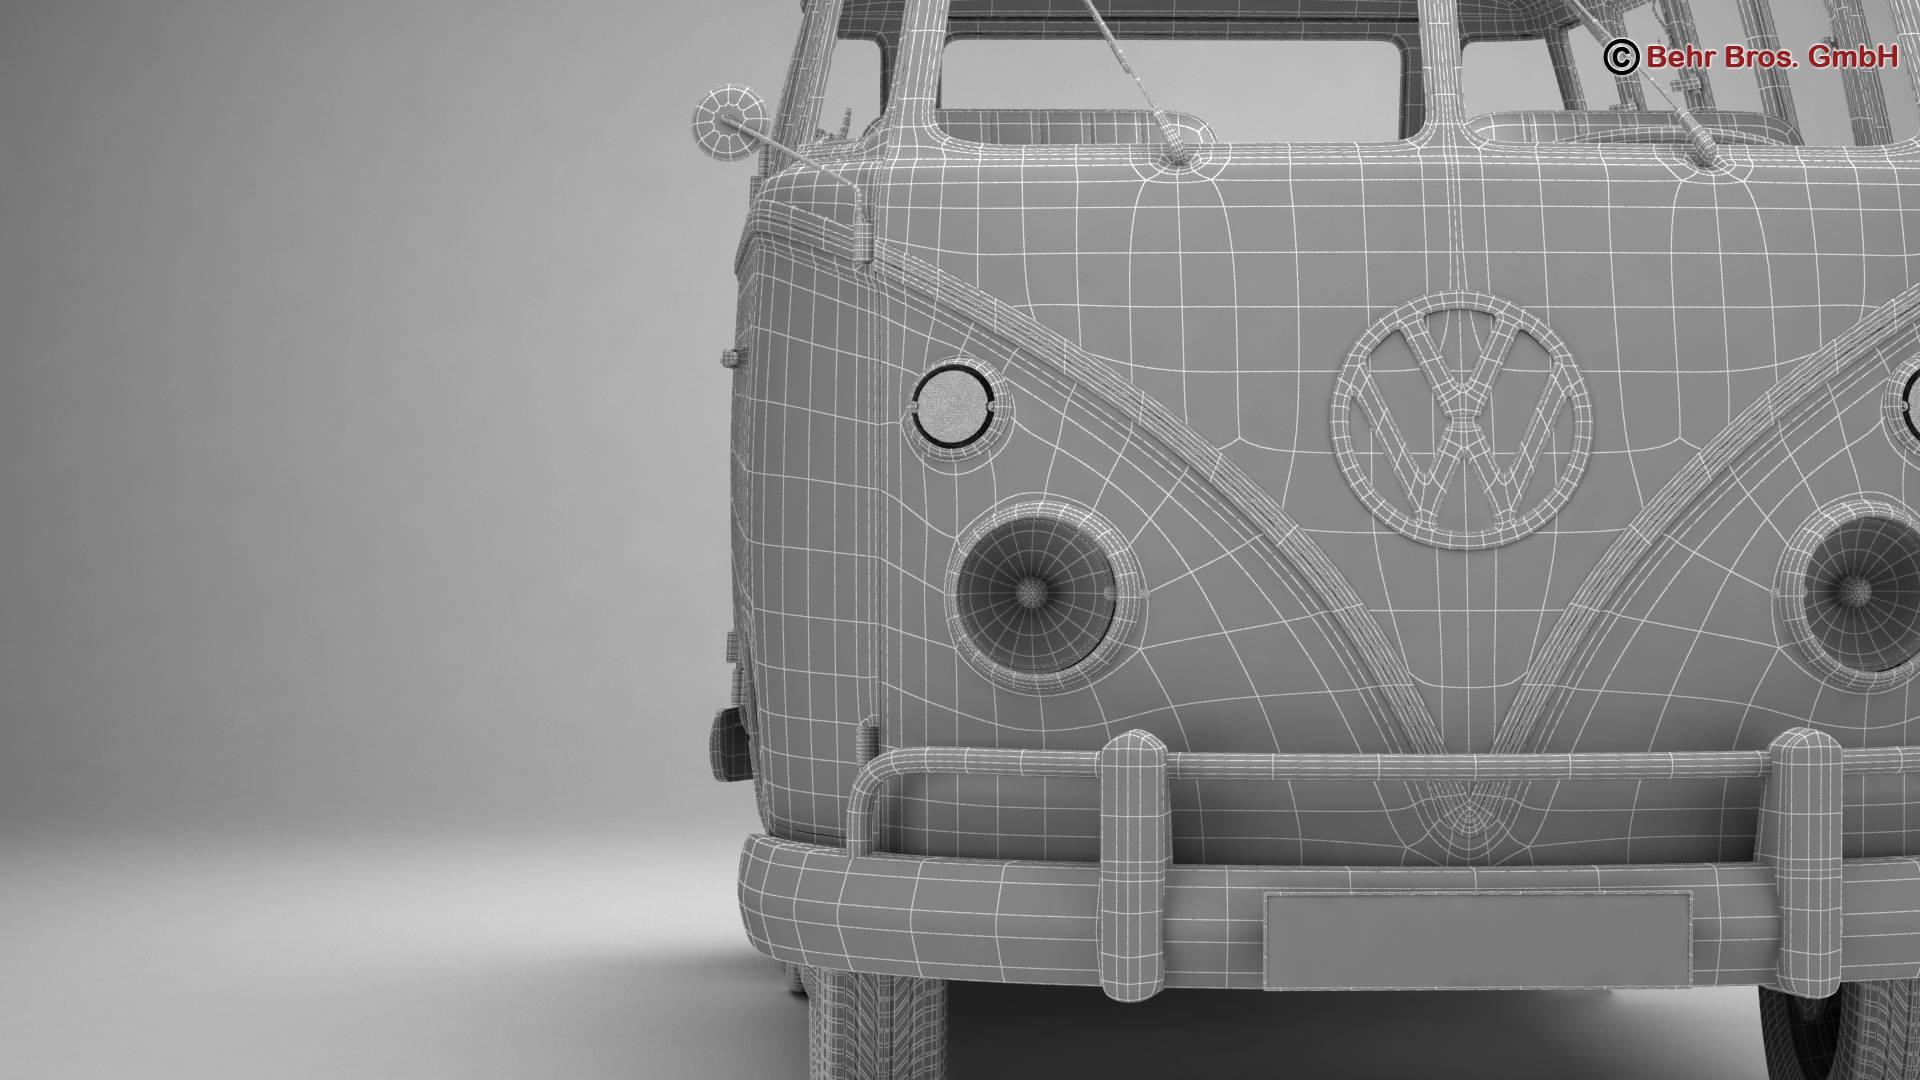 volkswagen type 2 samba 1963 hippie 3d model 3ds max fbx c4d lwo ma mb obj 217264